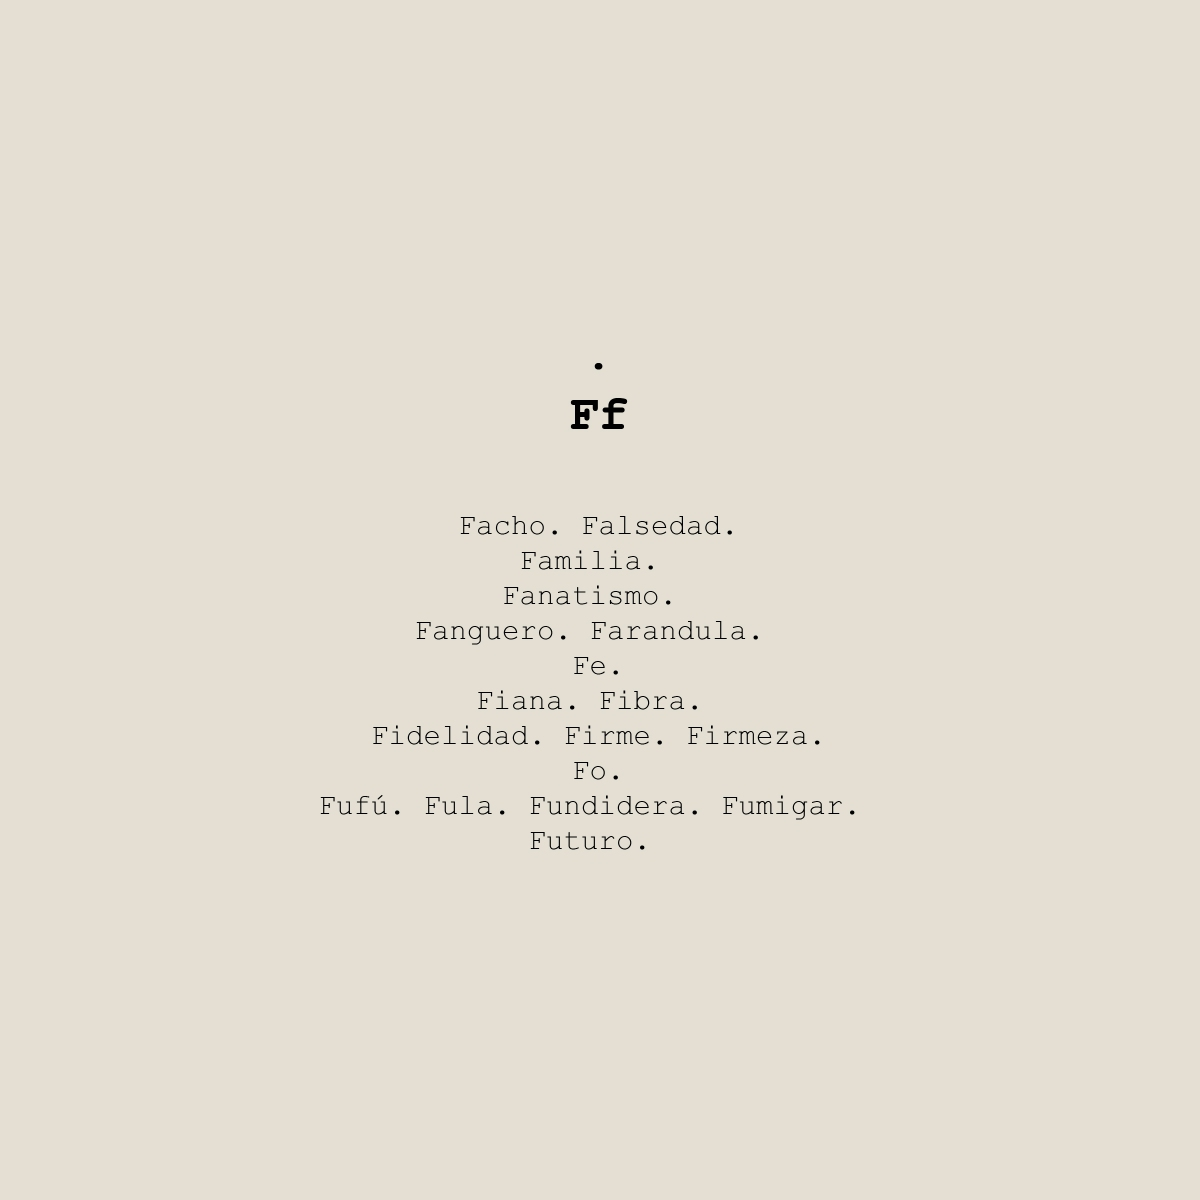 07Ff. Speech, 2007 - Performance, Book (Naivy Perez)